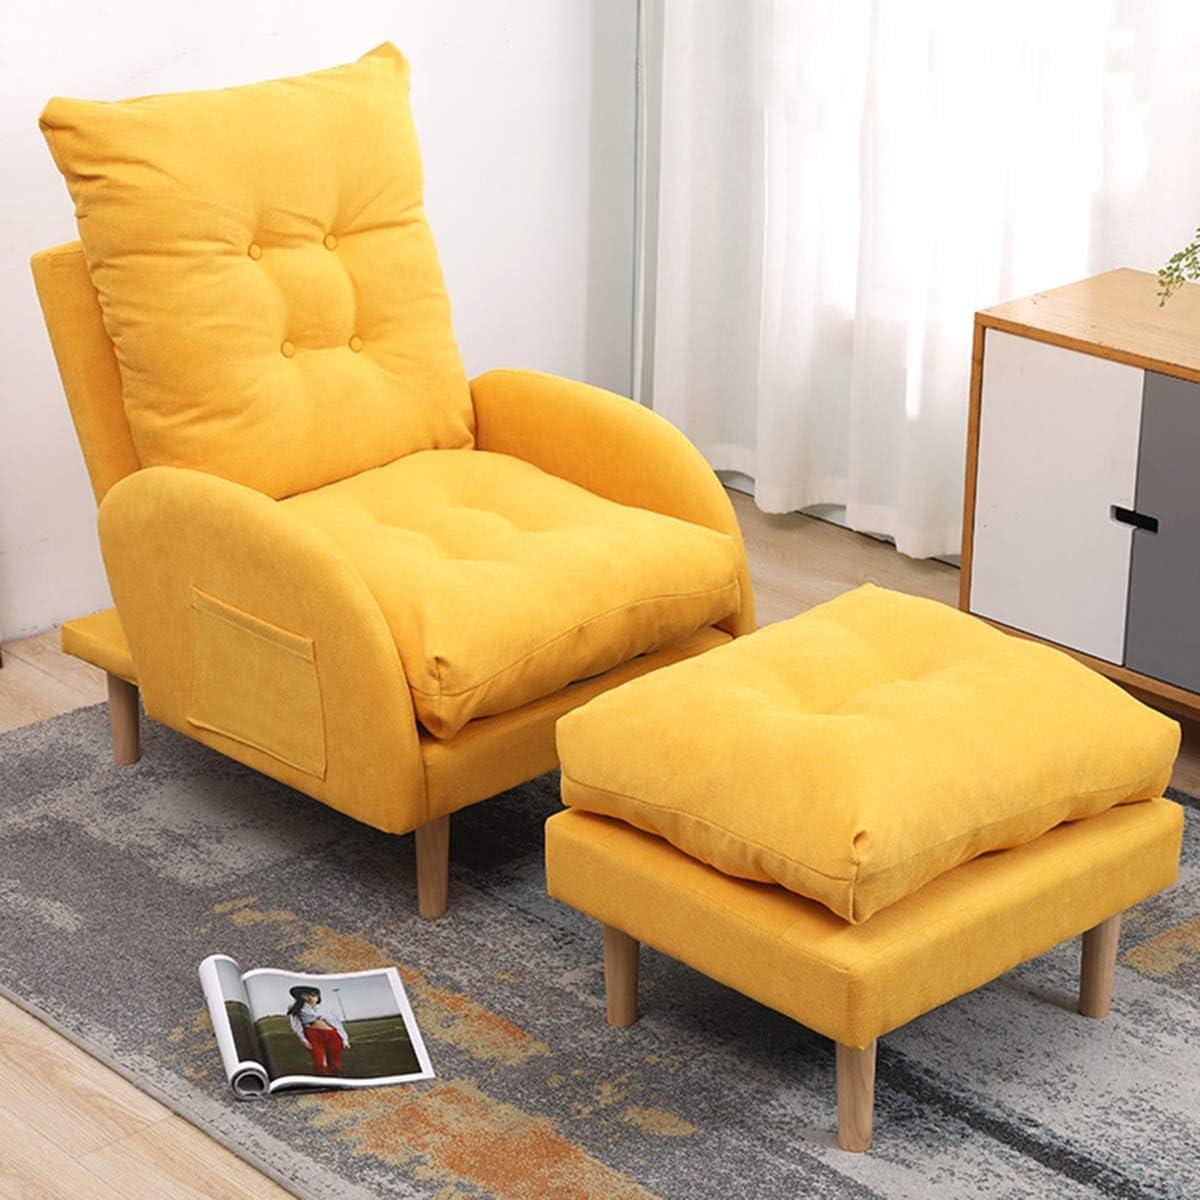 Lazy Sofa - Single Bed Chair Balcony Chai Tatami safety Lounge Arlington Mall